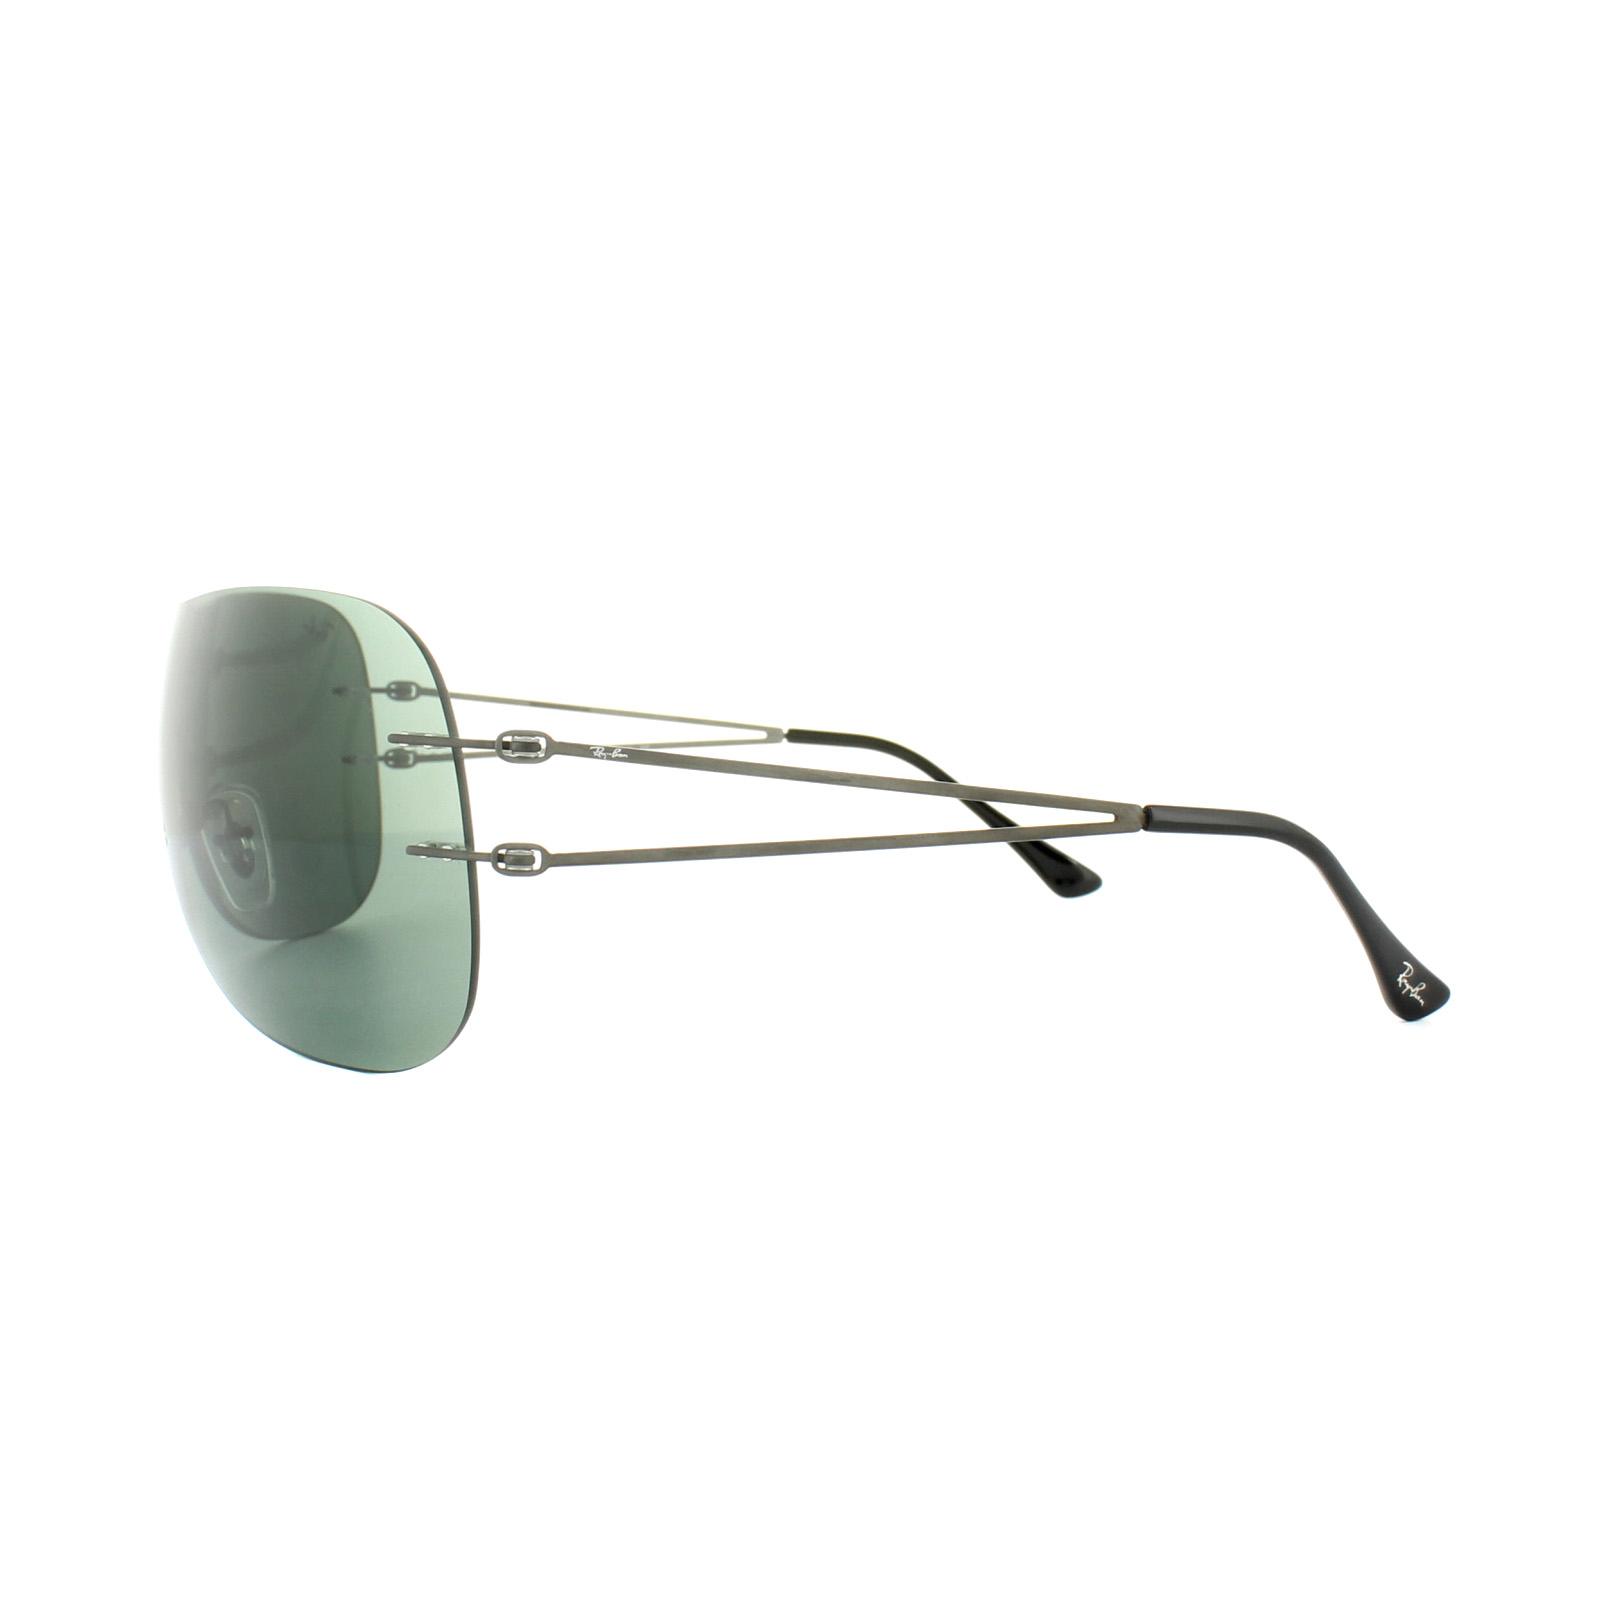 8a80a9e450 Ray-Ban Sunglasses 8057 154 71 Dark Gunmetal Green 8053672637441